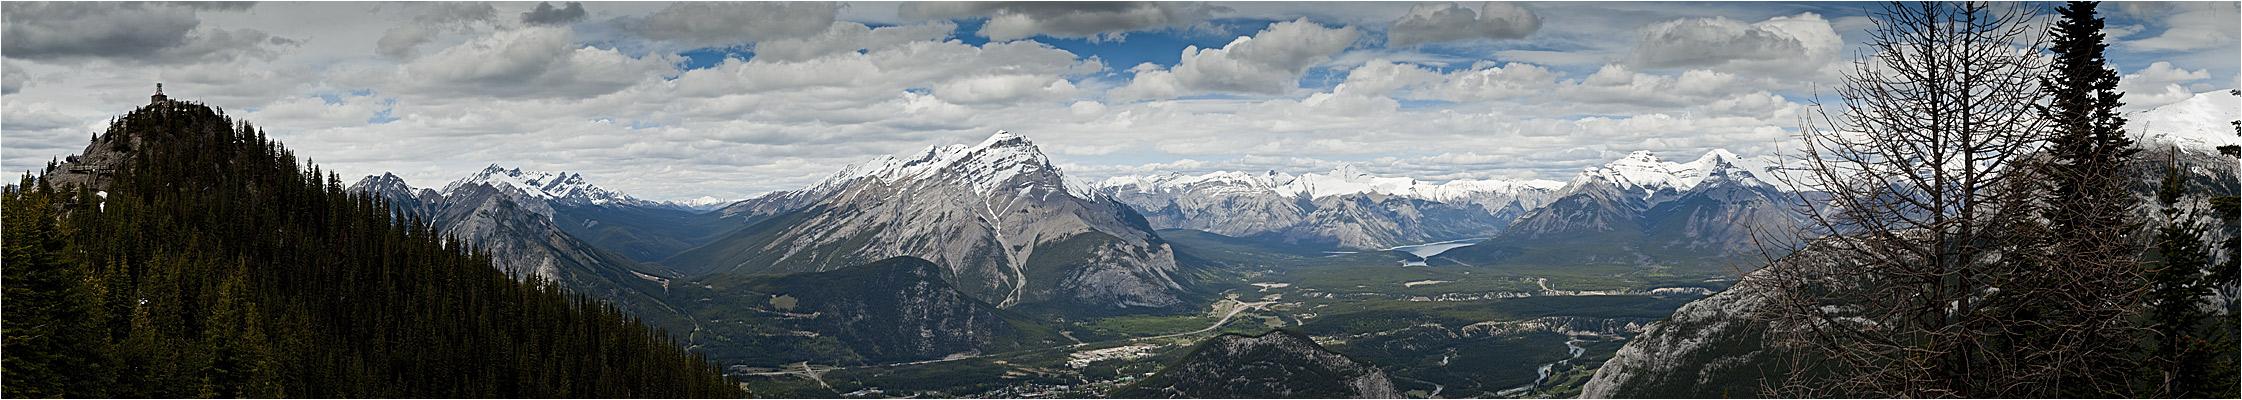 Blick vom Sulphur Mountain